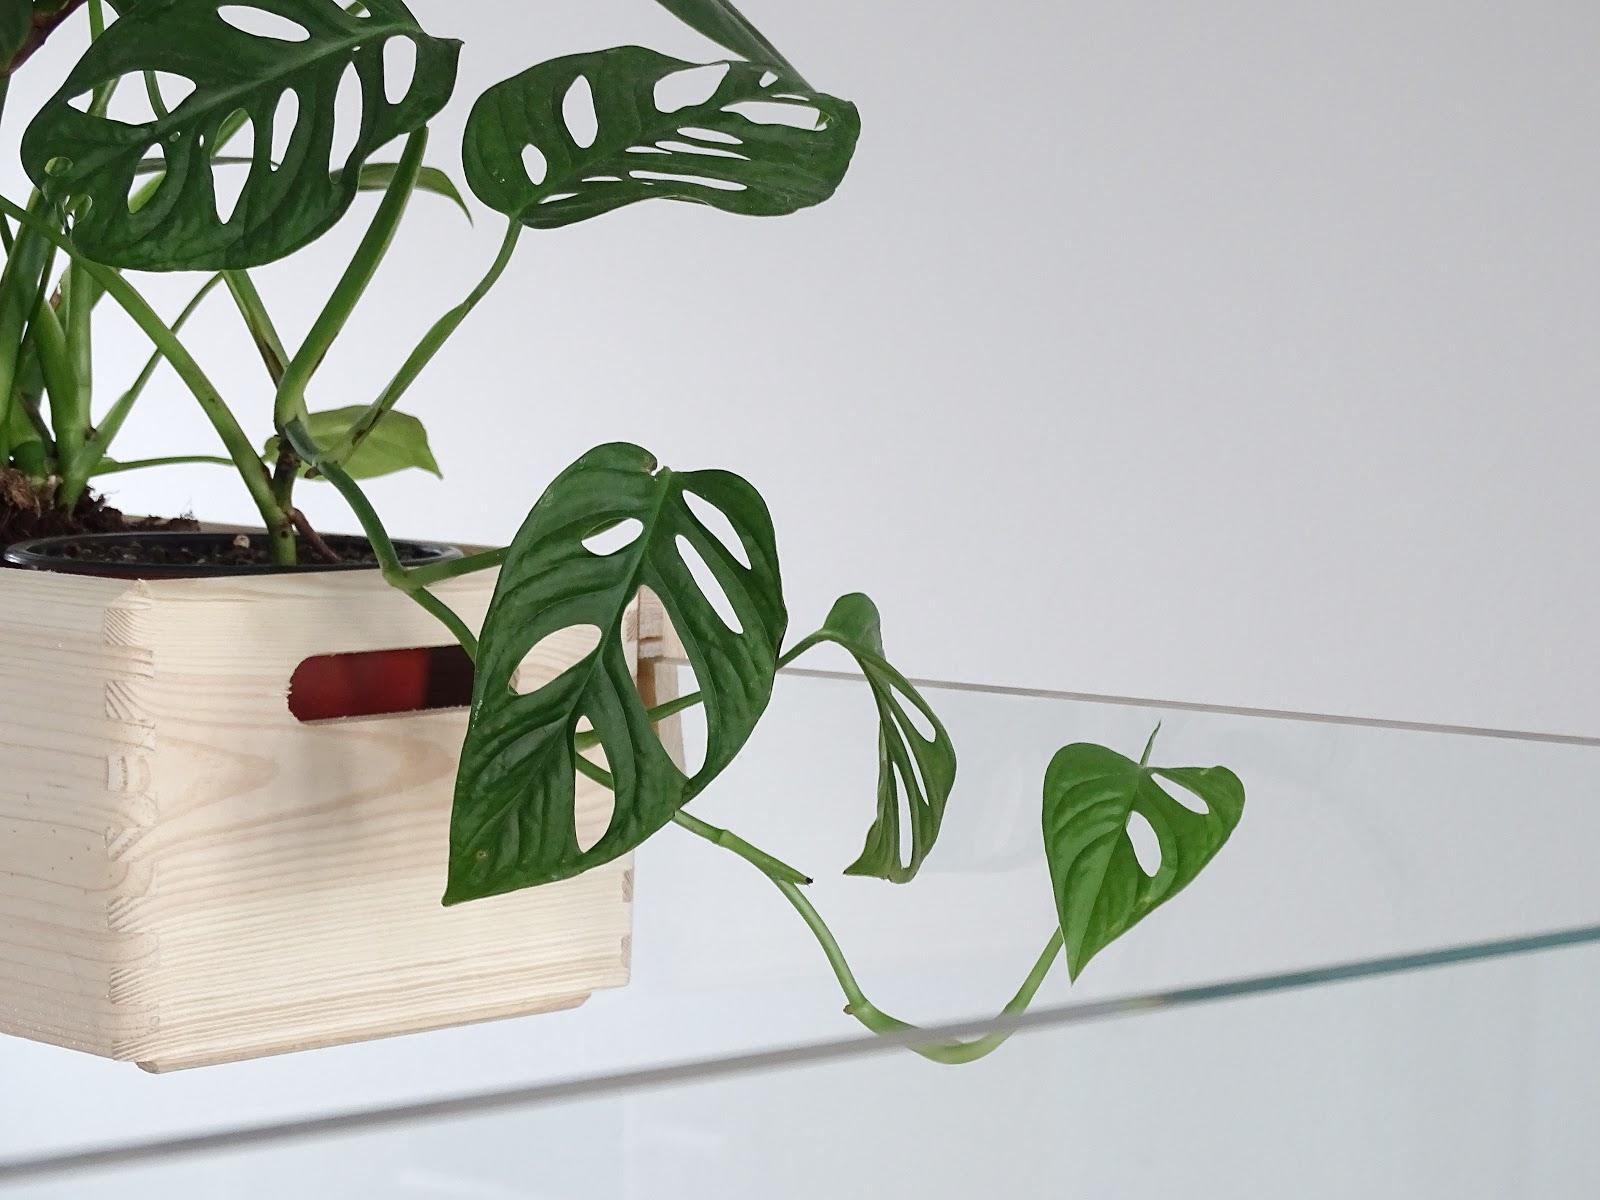 auf der mammilade n seite des lebens personal lifestyle diy and interior blog diy. Black Bedroom Furniture Sets. Home Design Ideas